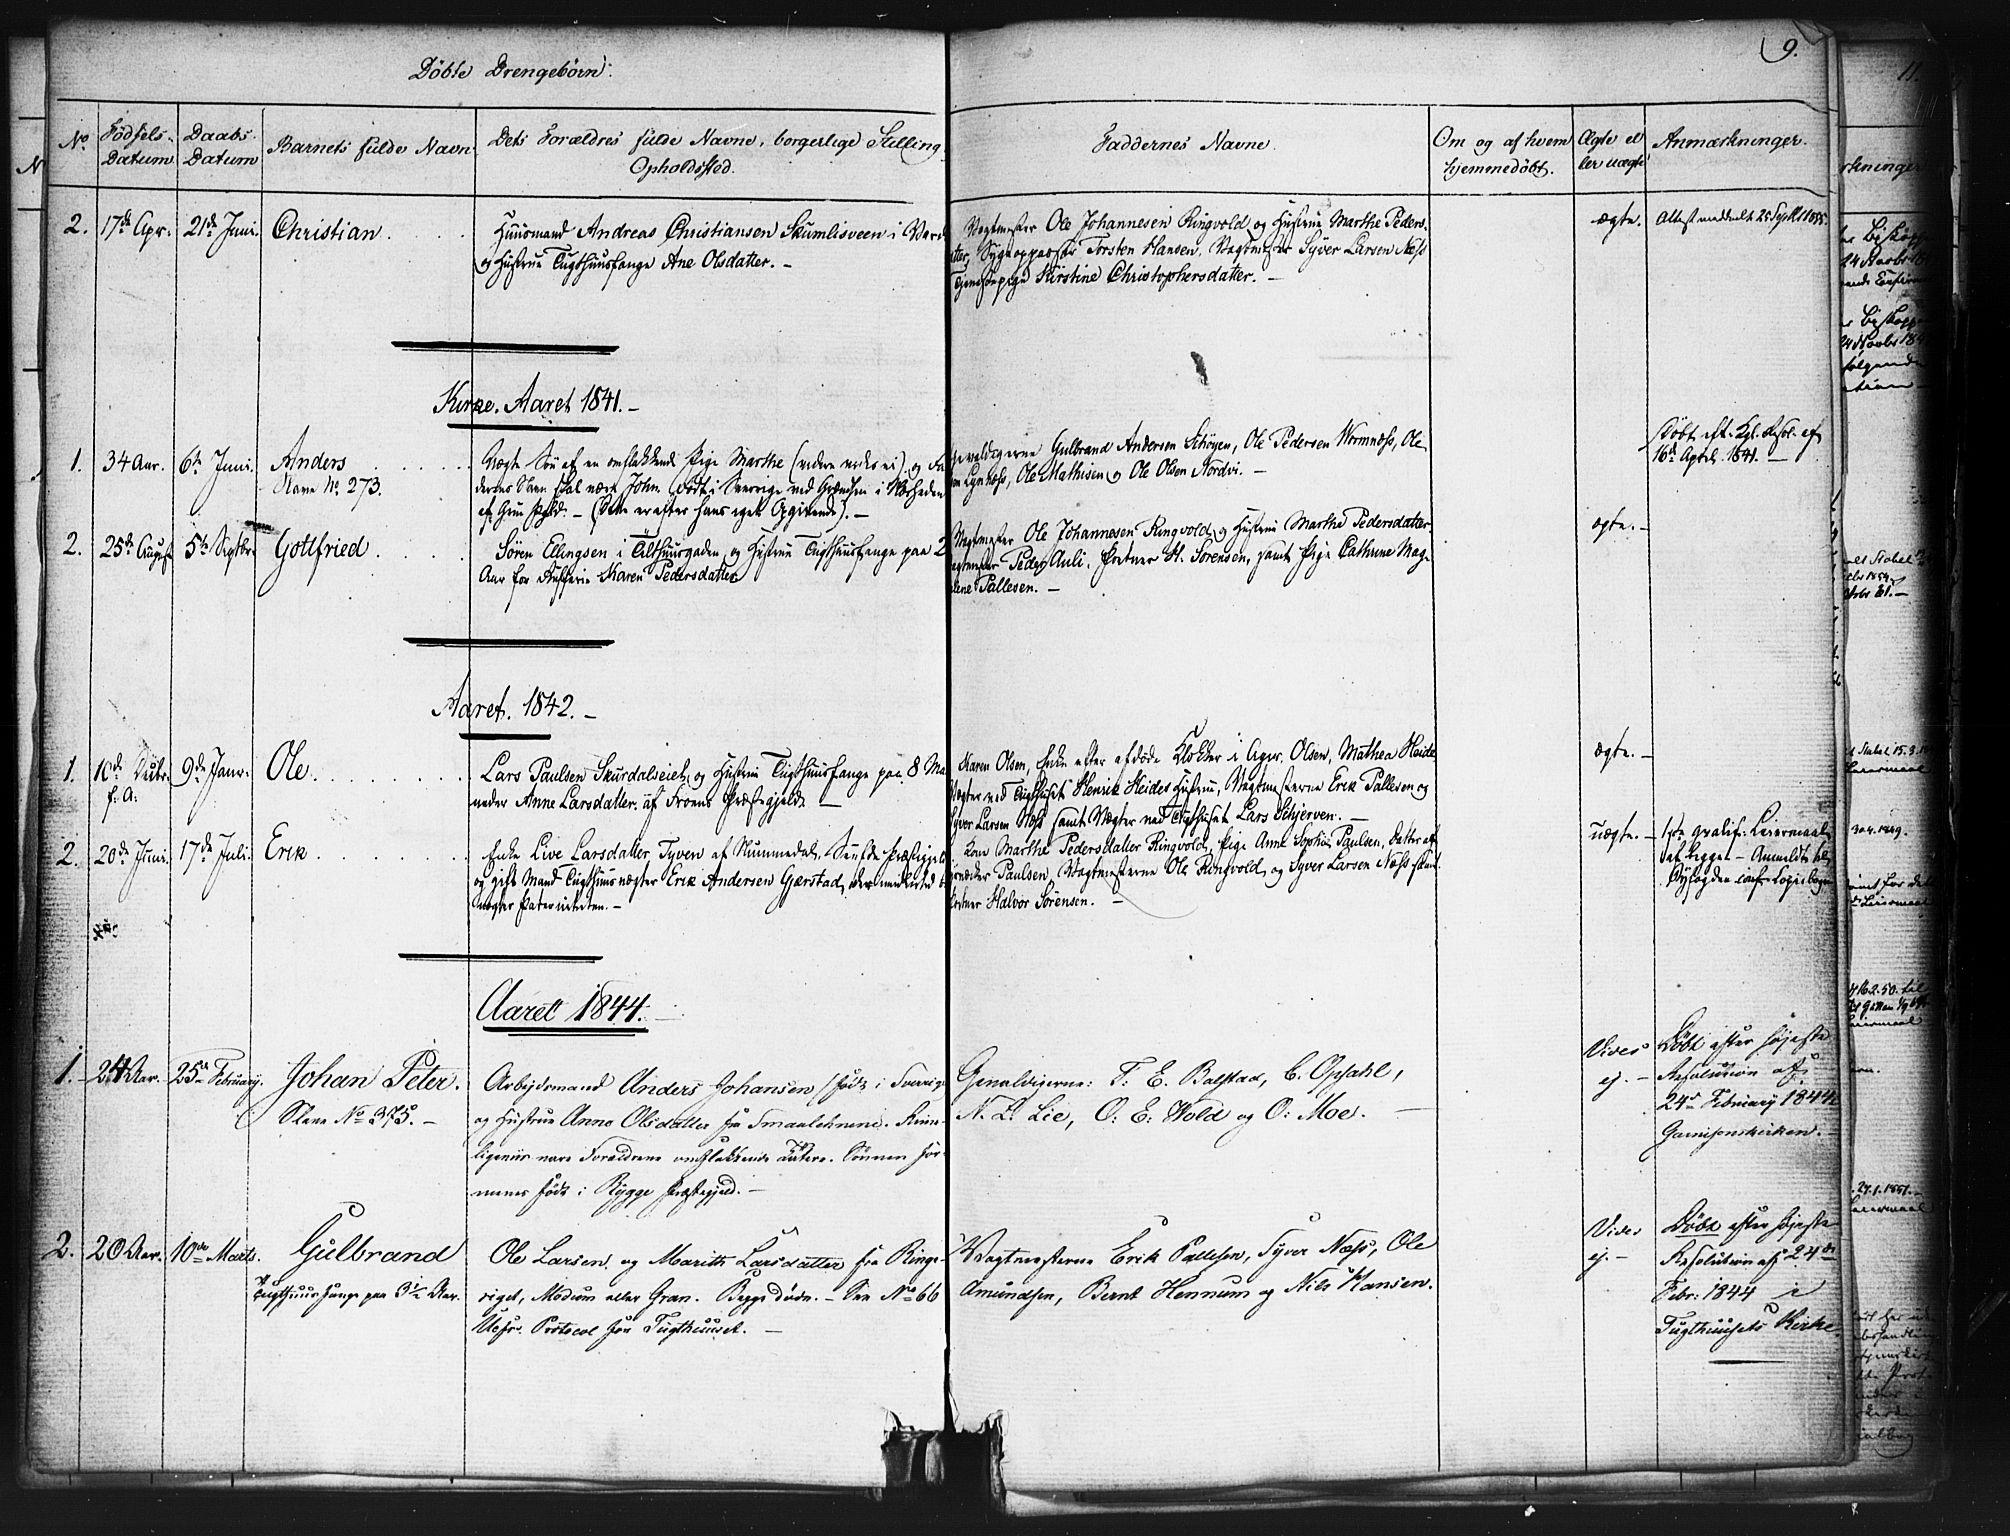 SAO, Kristiania tukthusprest Kirkebøker, F/Fa/L0003: Ministerialbok nr. 3, 1831-1865, s. 9